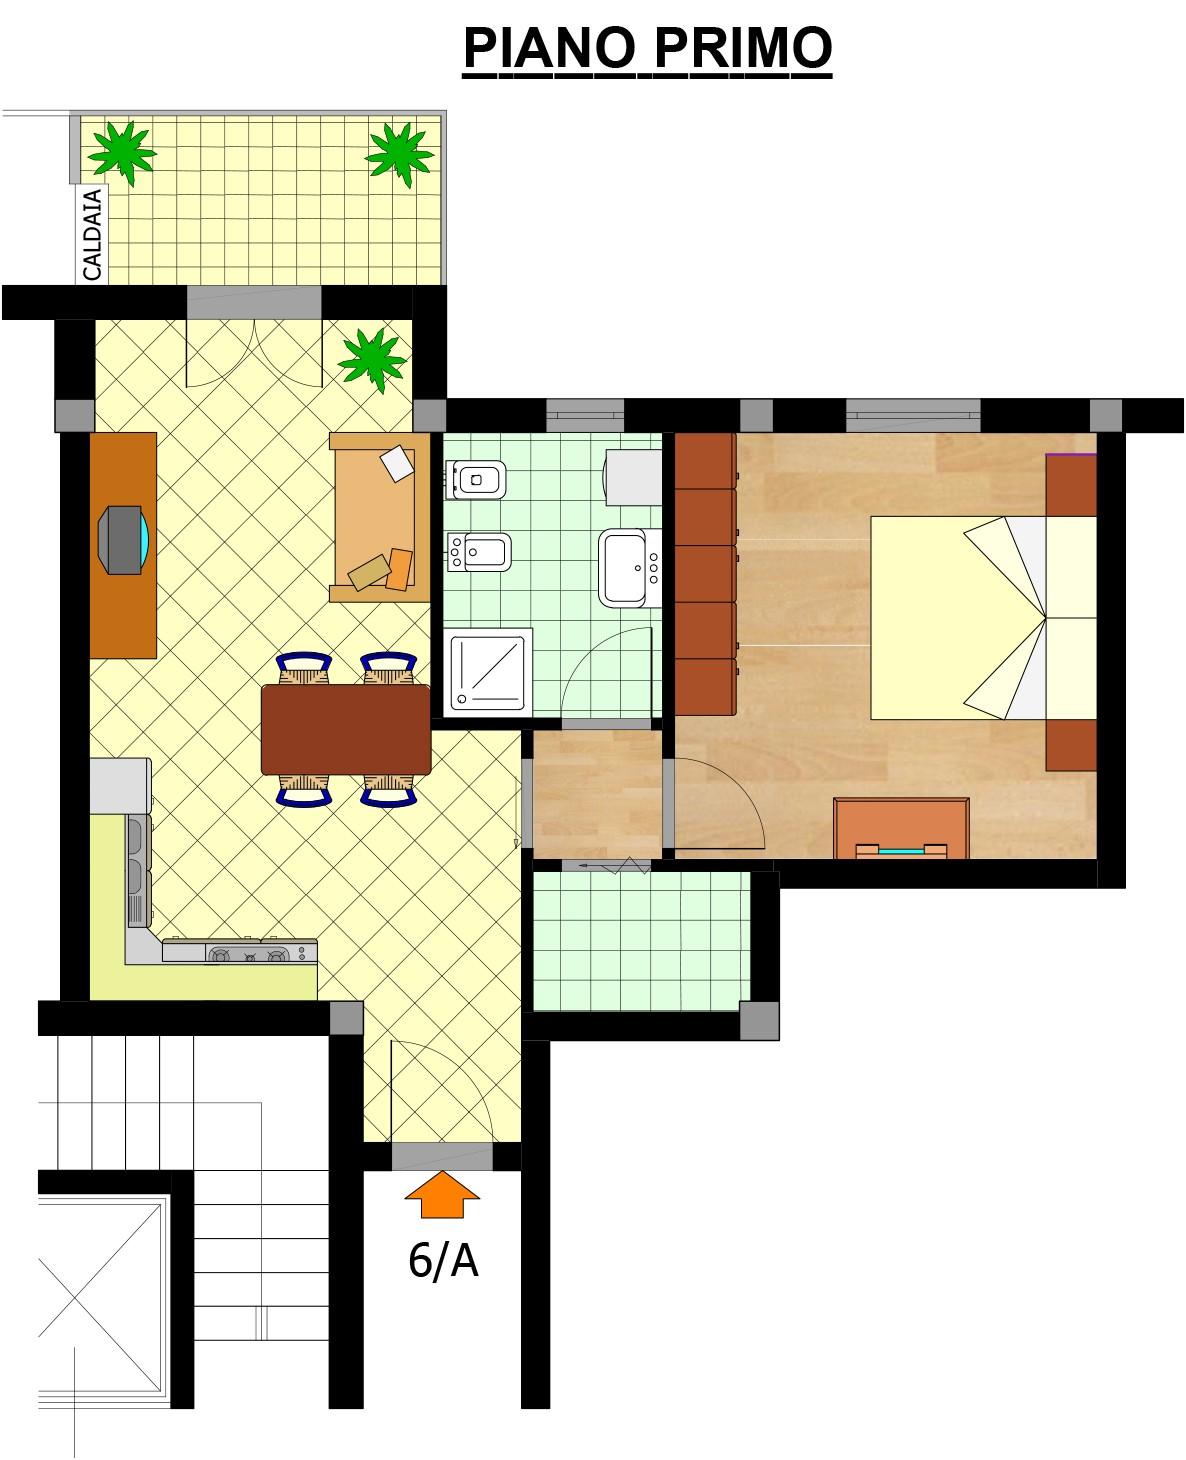 Planmetria Appartamento 6A